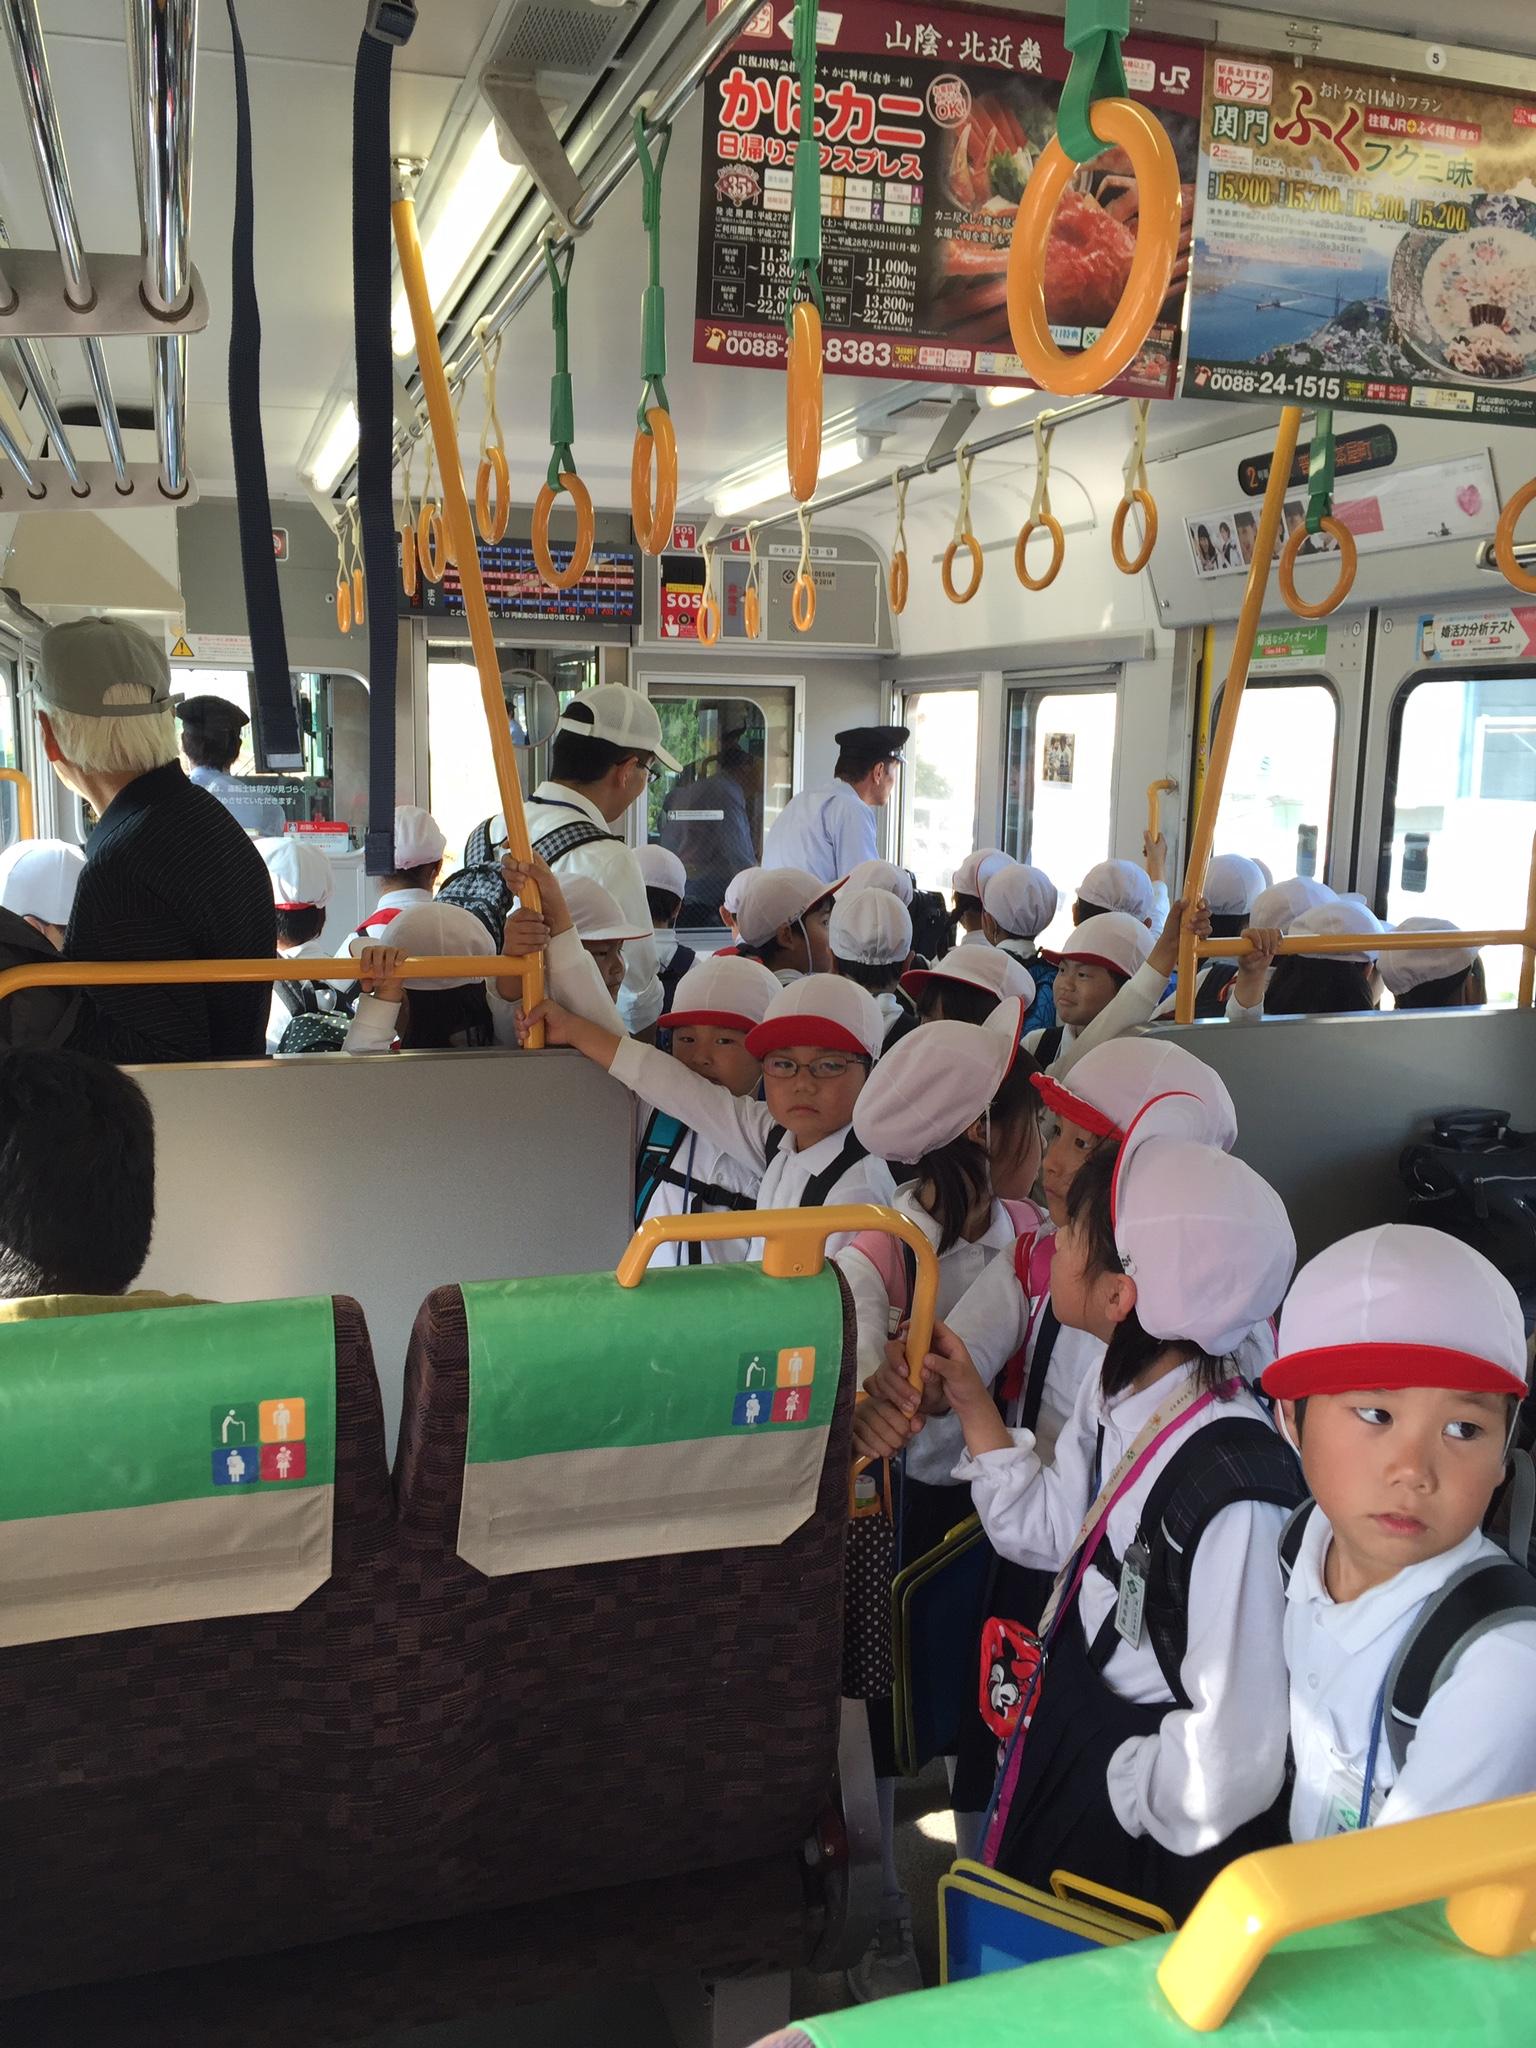 School trip on the train!